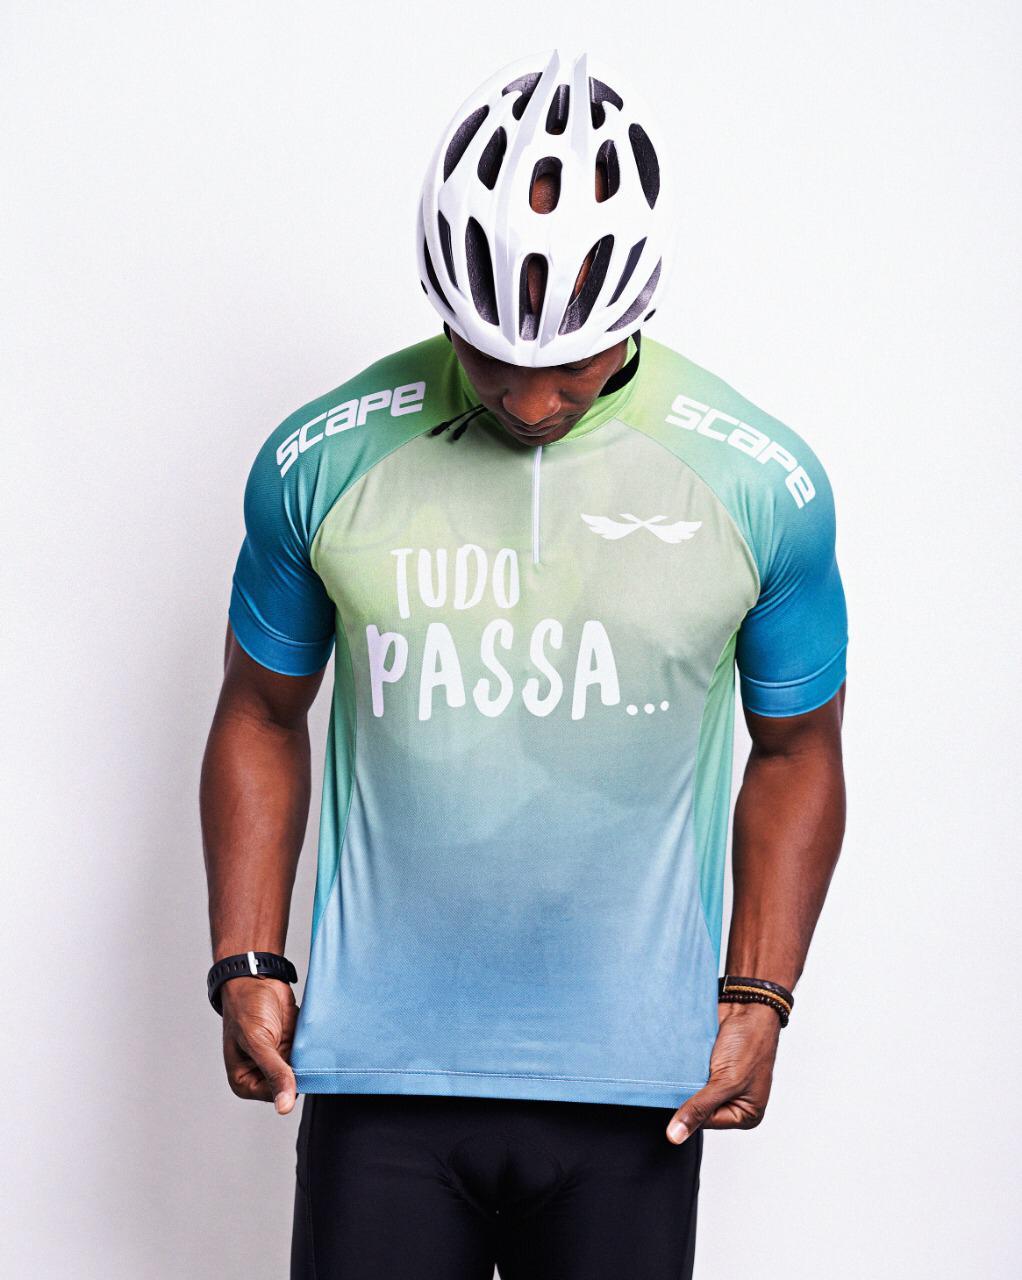 Camisa Ciclismo Scape Tudo Passa